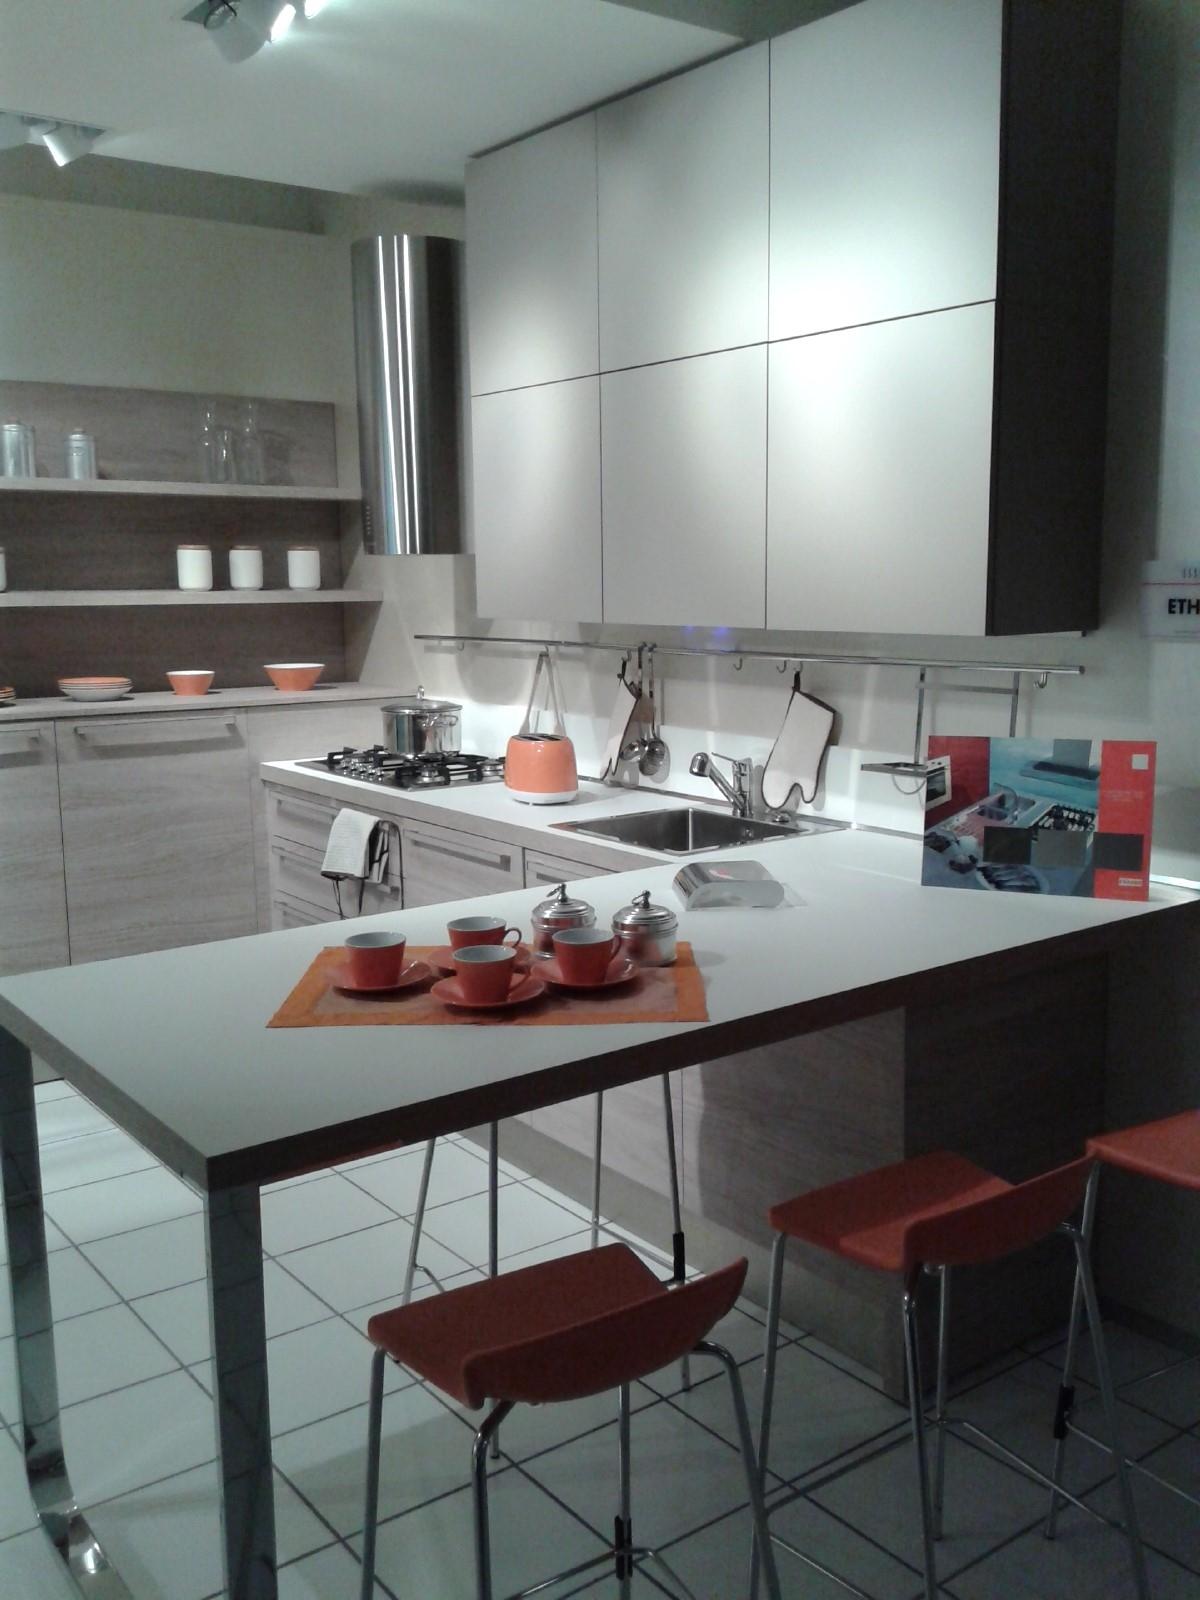 Cucina Veneta Cucine Ethica Decorativo Laminato Materico Cucine A  #8C503F 1200 1600 Veneta Cucine è Una Buona Marca